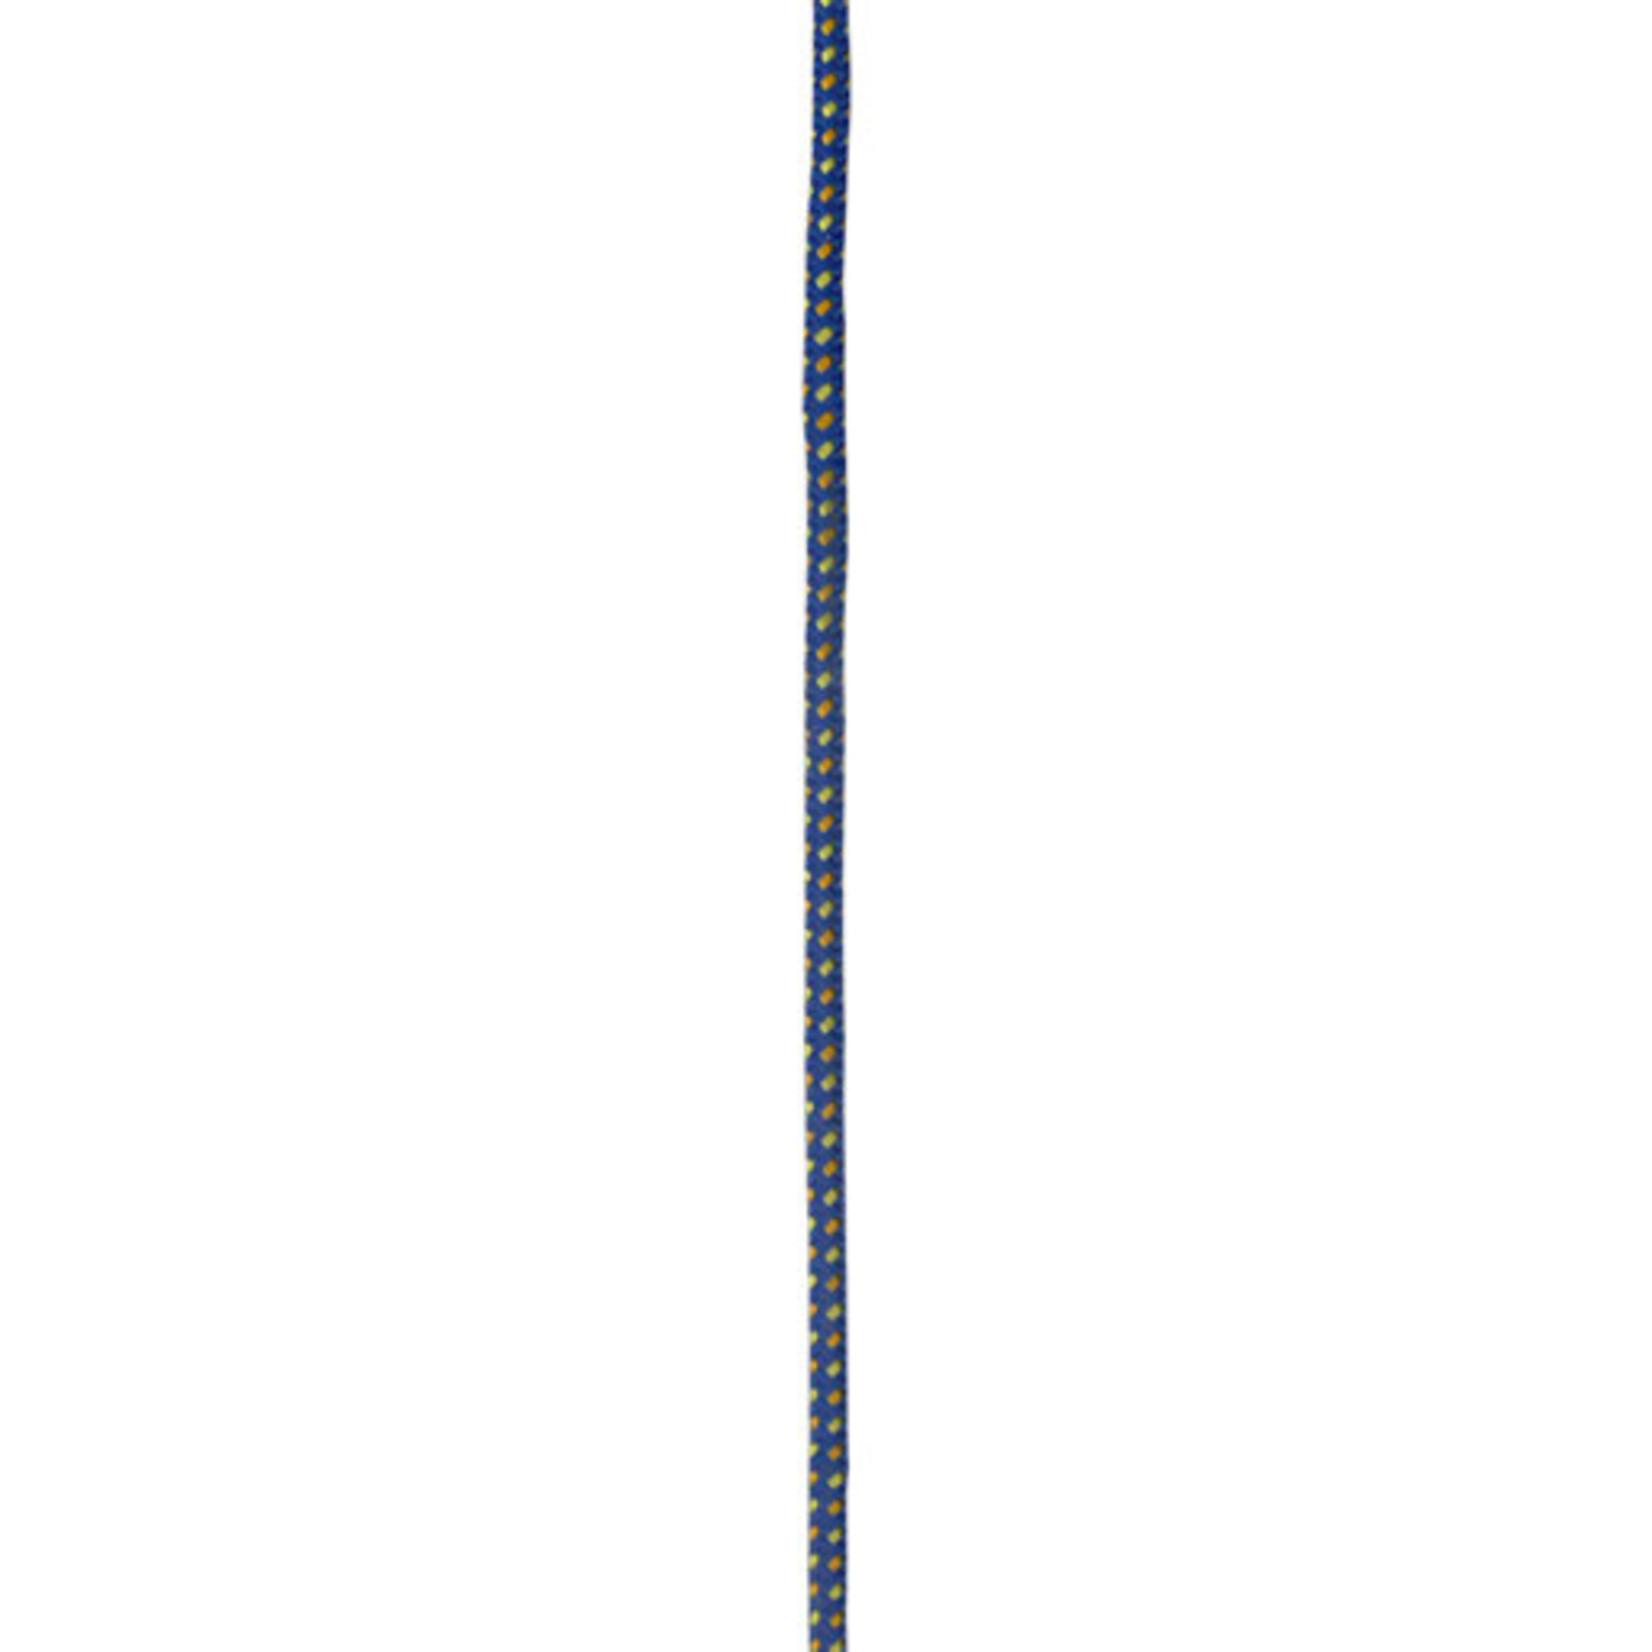 Edelrid Edelrid Multicords - 3 mm